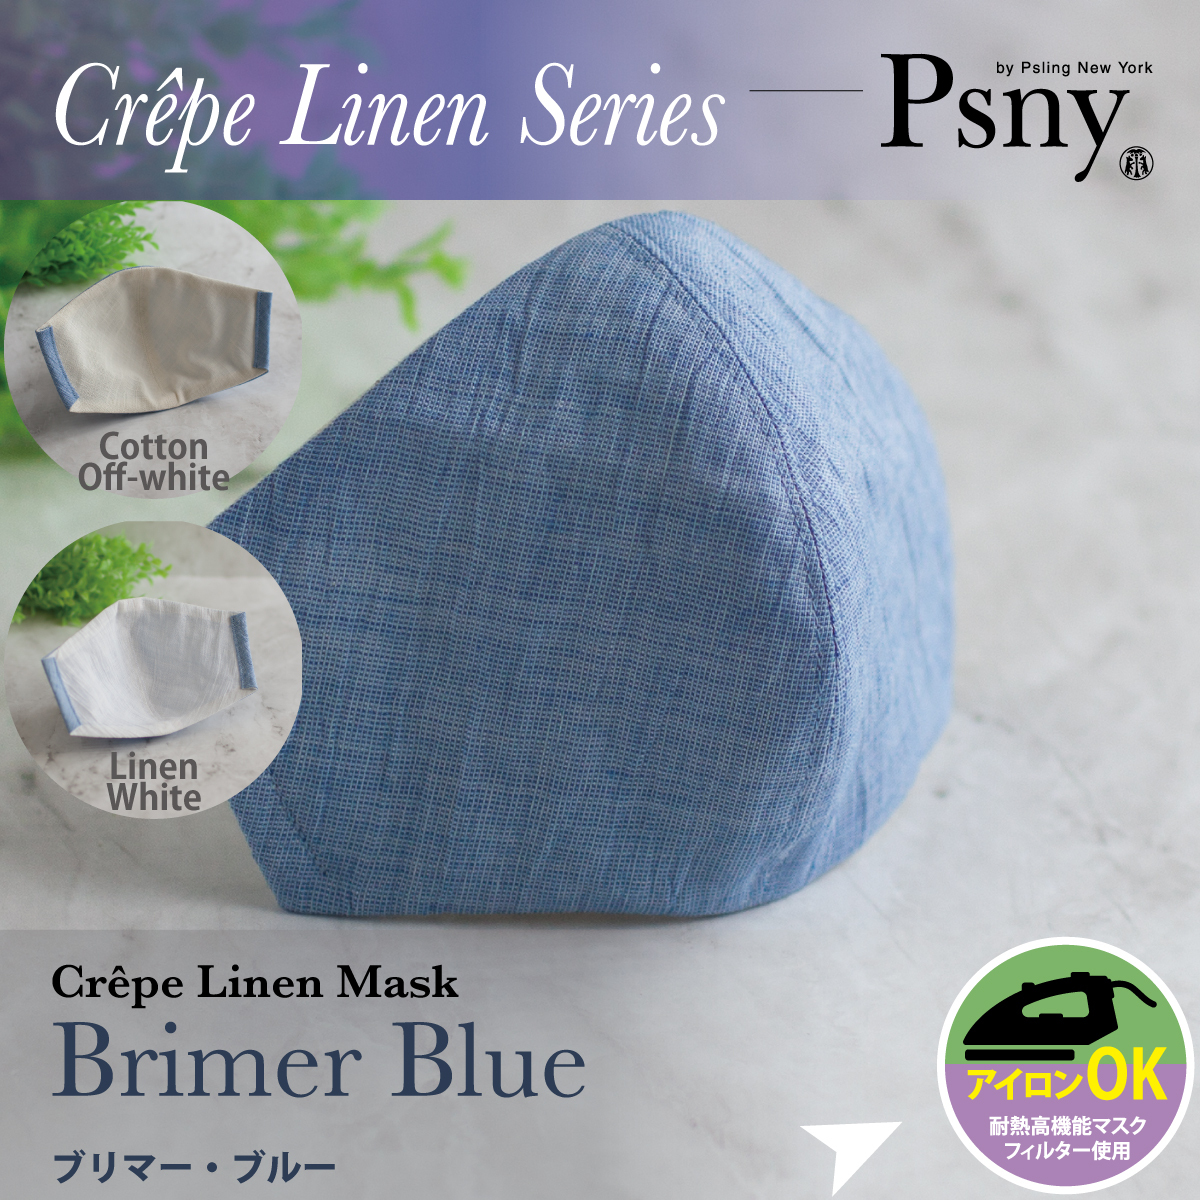 PSNY クレープ リネン・ブリマー・ブルー 花粉 黄砂 洗える不織布フィルター入り 立体 大人用 マスク 送料無料 P05